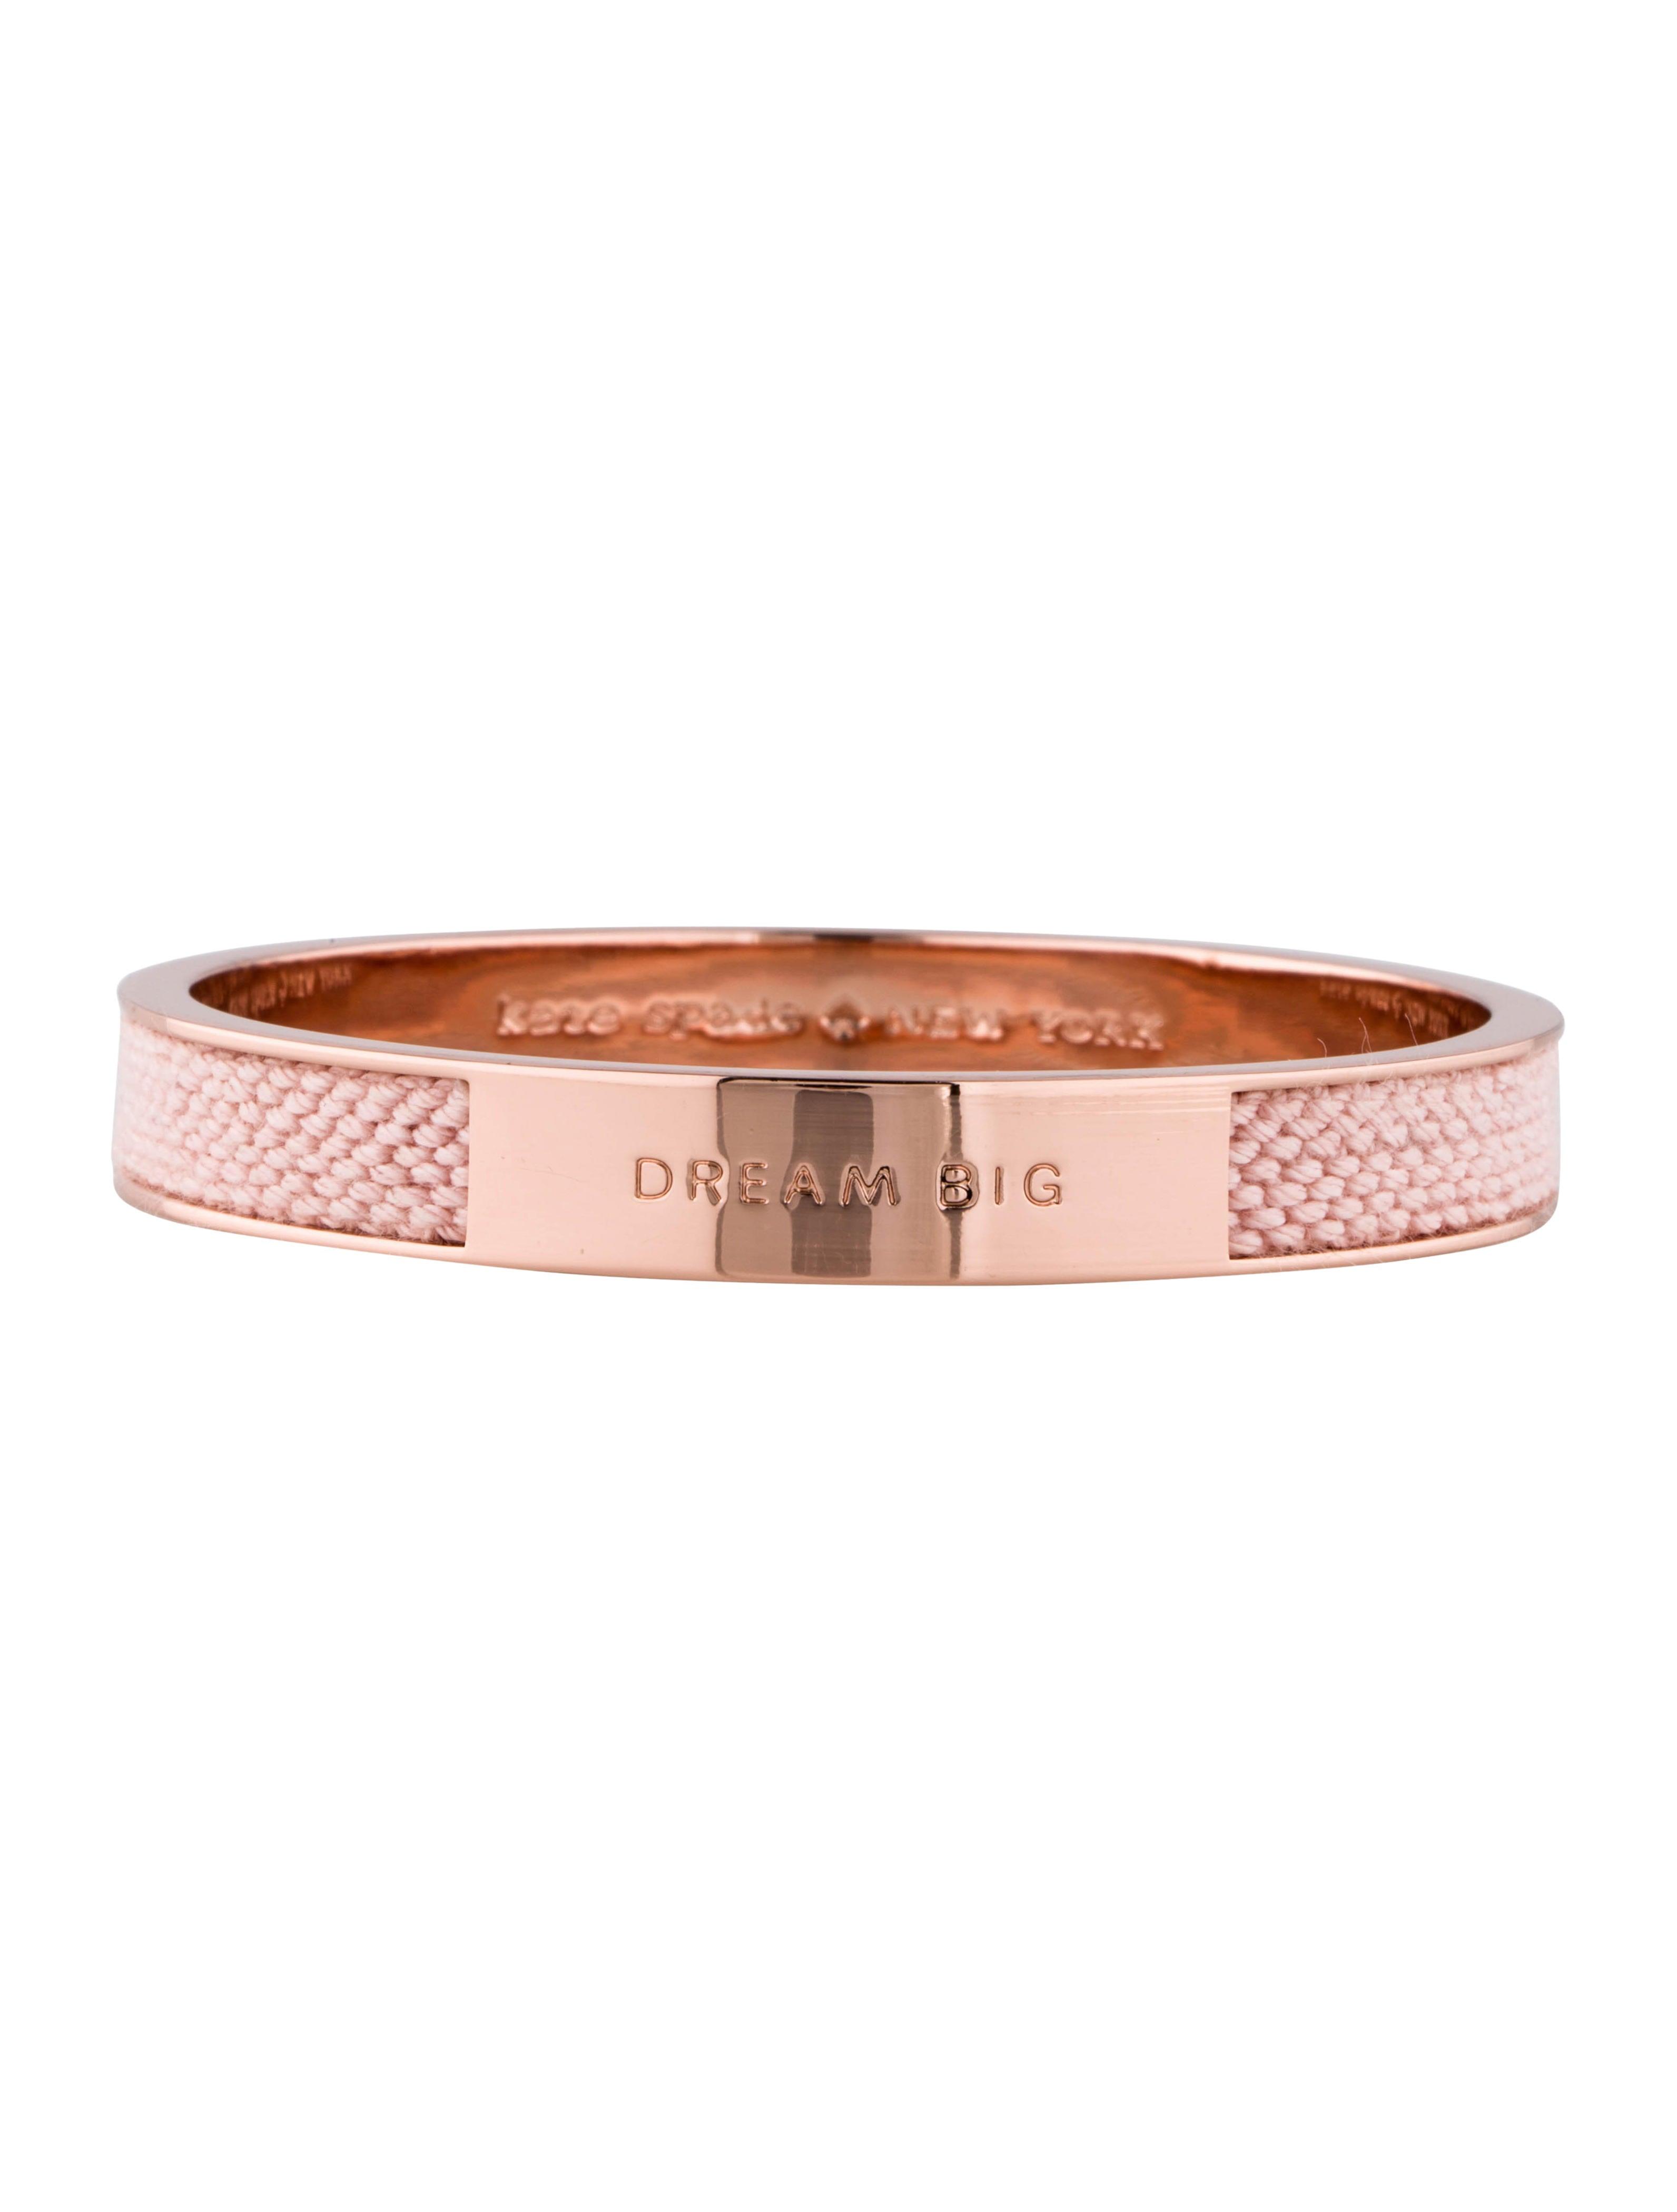 Kate Spade New York Dream Big Bangle - Bracelets - WKA31781 | The ...